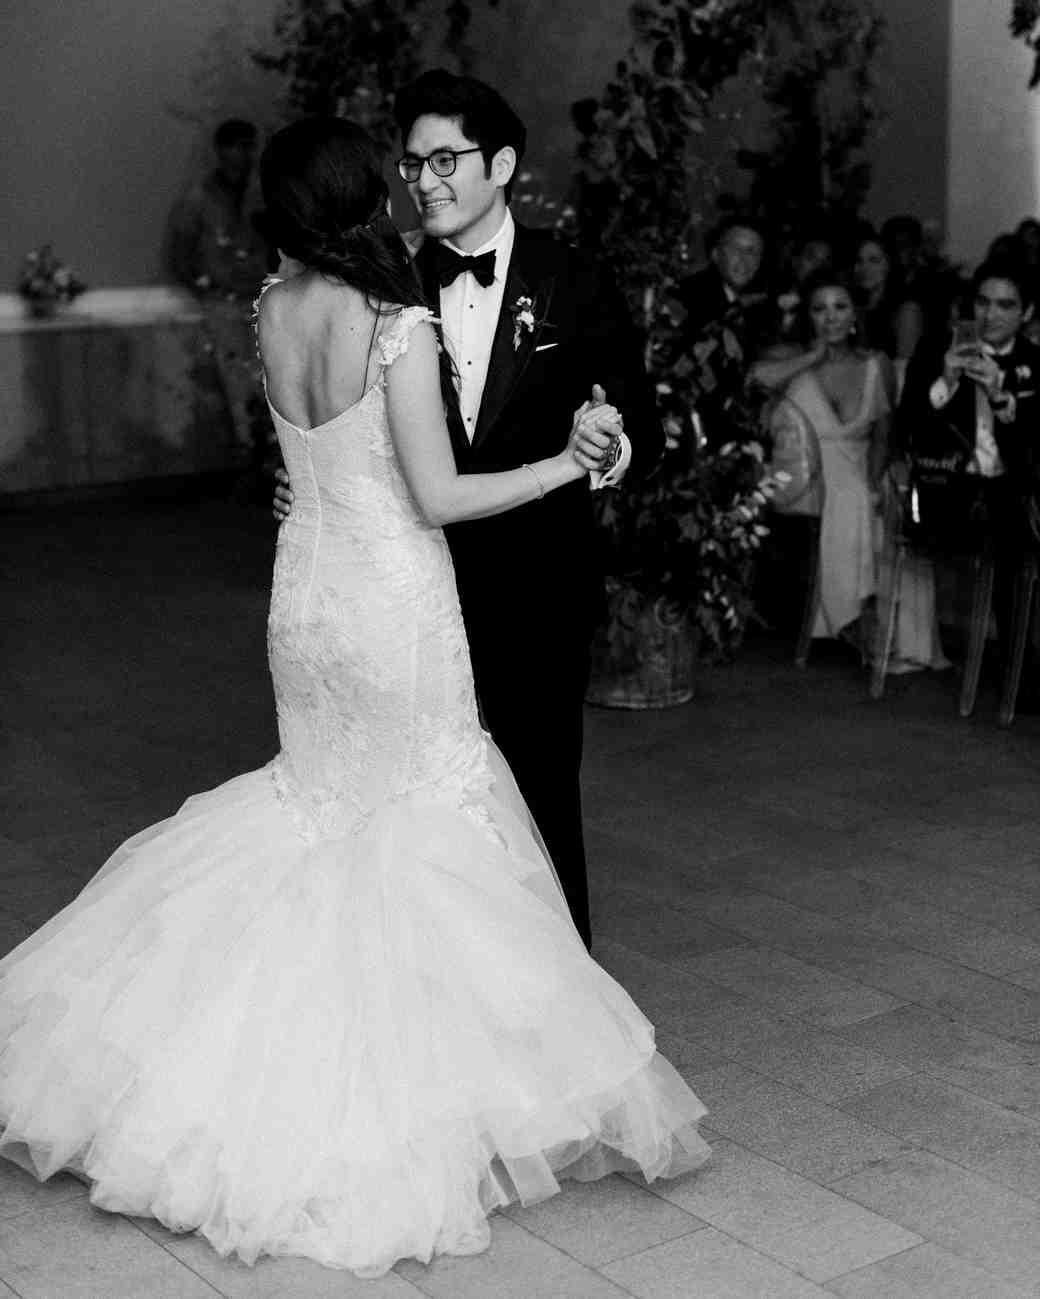 285c6545ded A Romantic Garden Wedding in the Heart of Houston